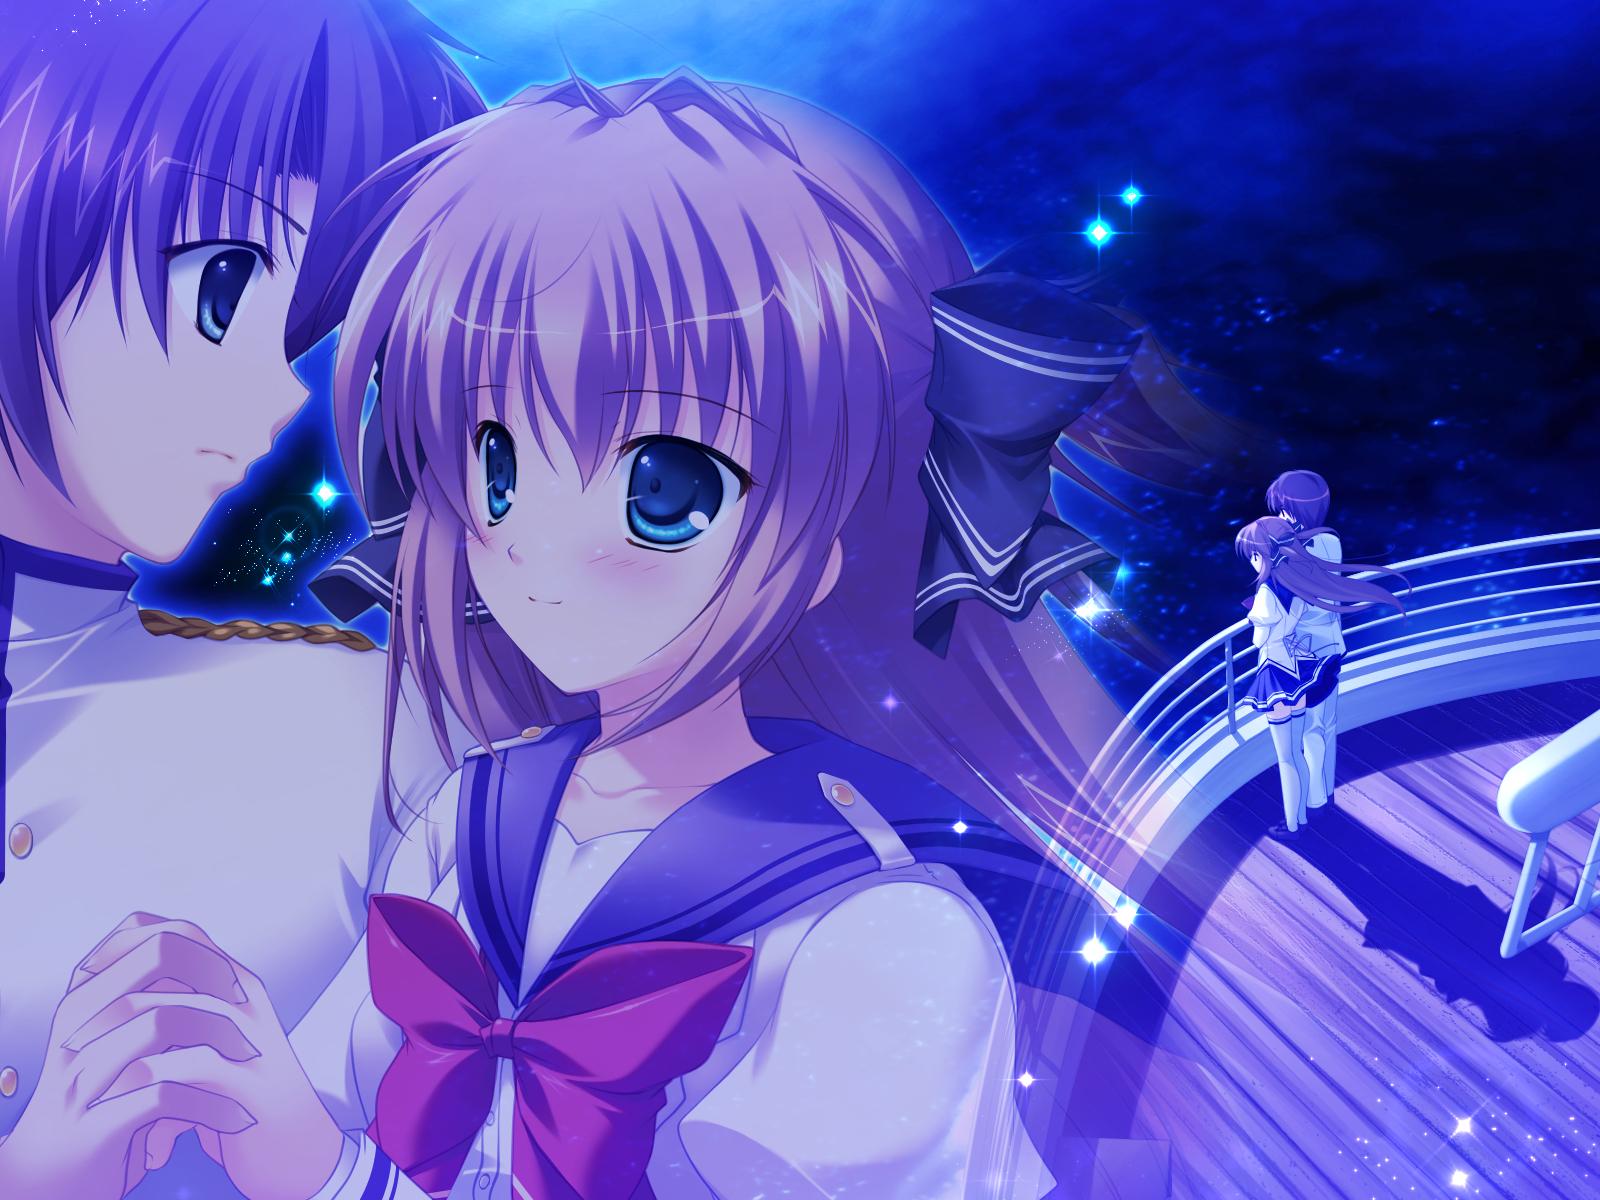 asuka_mirai blue_eyes bow brown_hair game_cg journey mikeou nanairo_kouro night school_uniform thighhighs